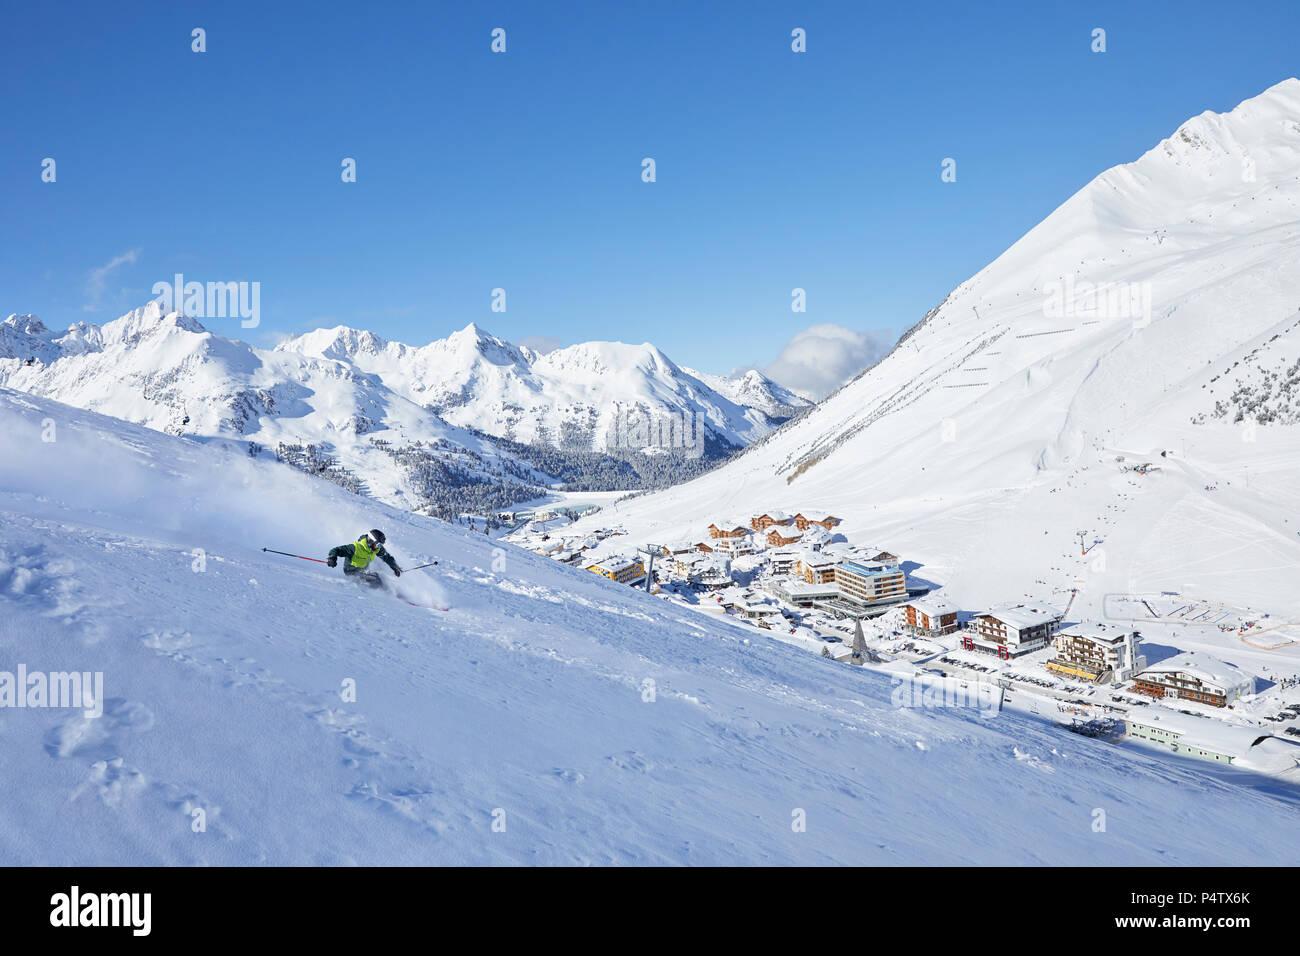 Austria, Tyrol, Kuehtai, man skiing in winter landscape - Stock Image